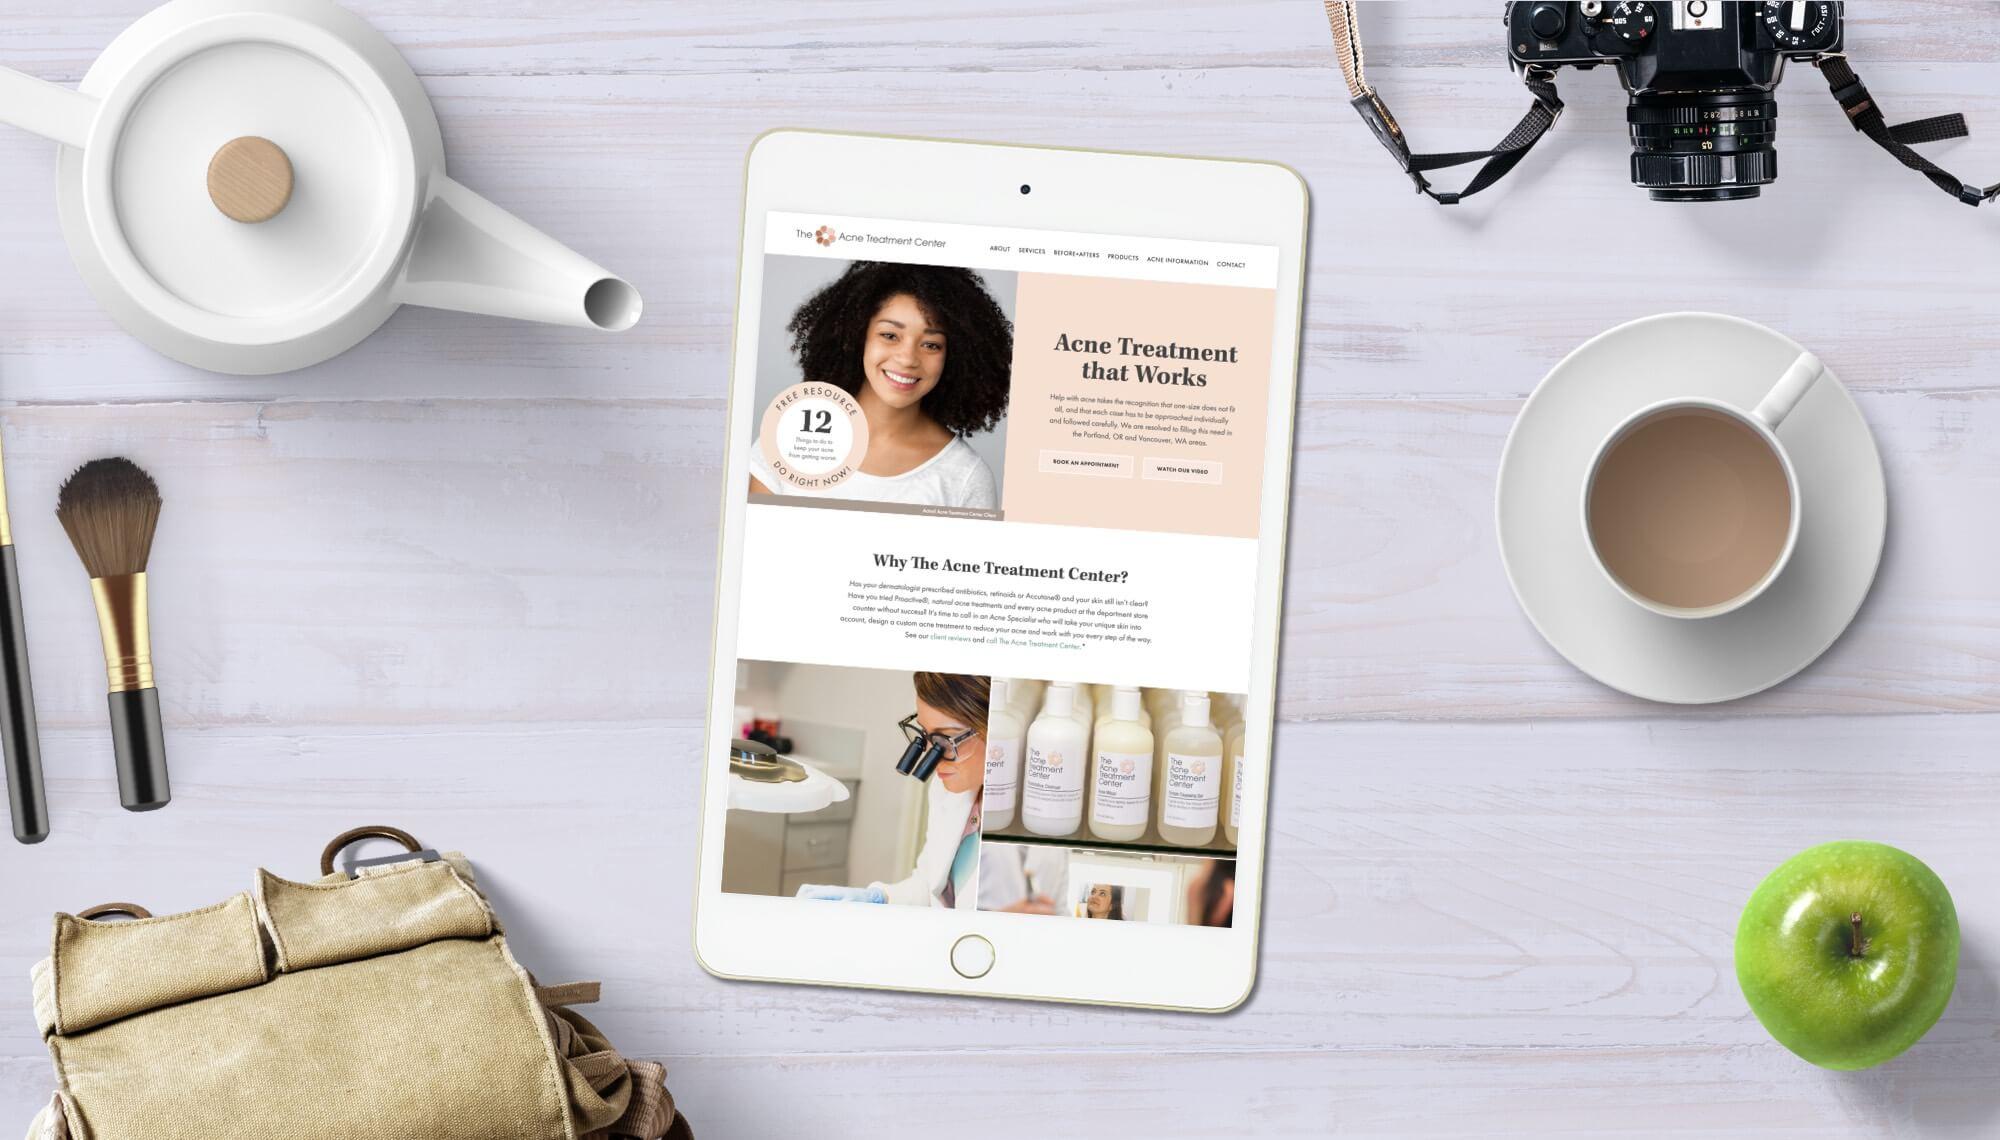 Acne Treatment Center Website Design